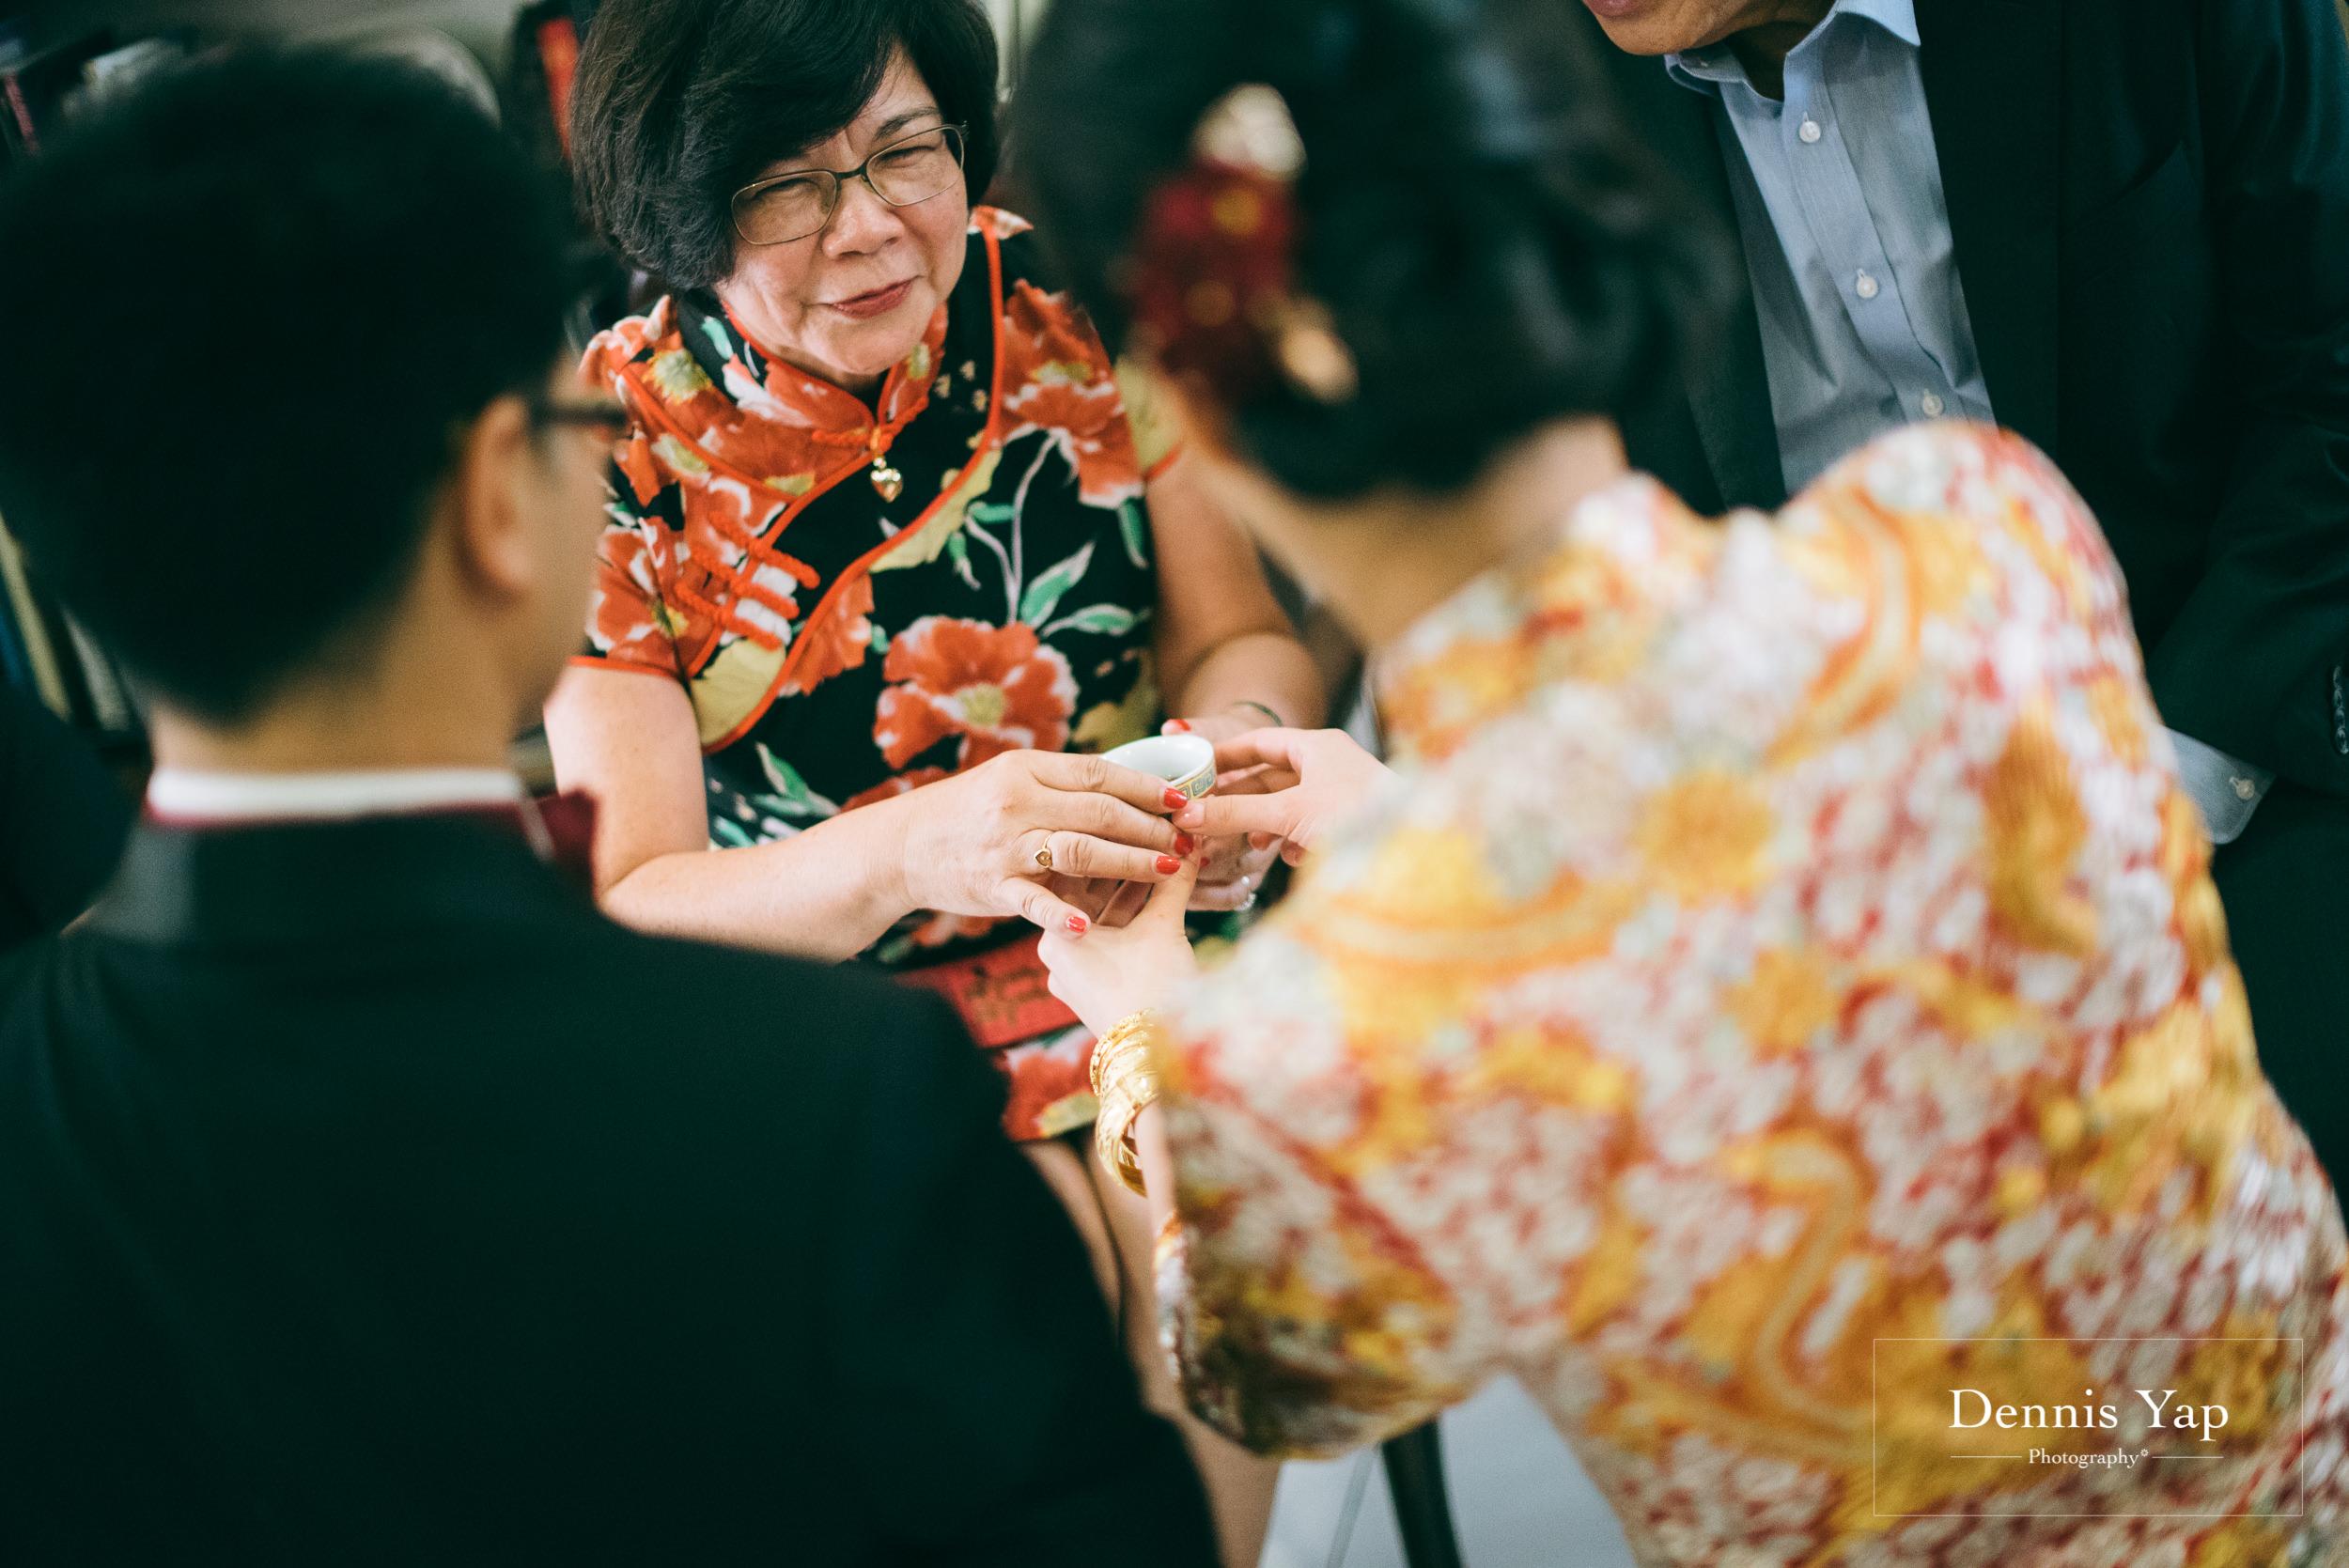 wai keong jenny wedding day bangsar dennis yap photography emotions beloved family-20.jpg